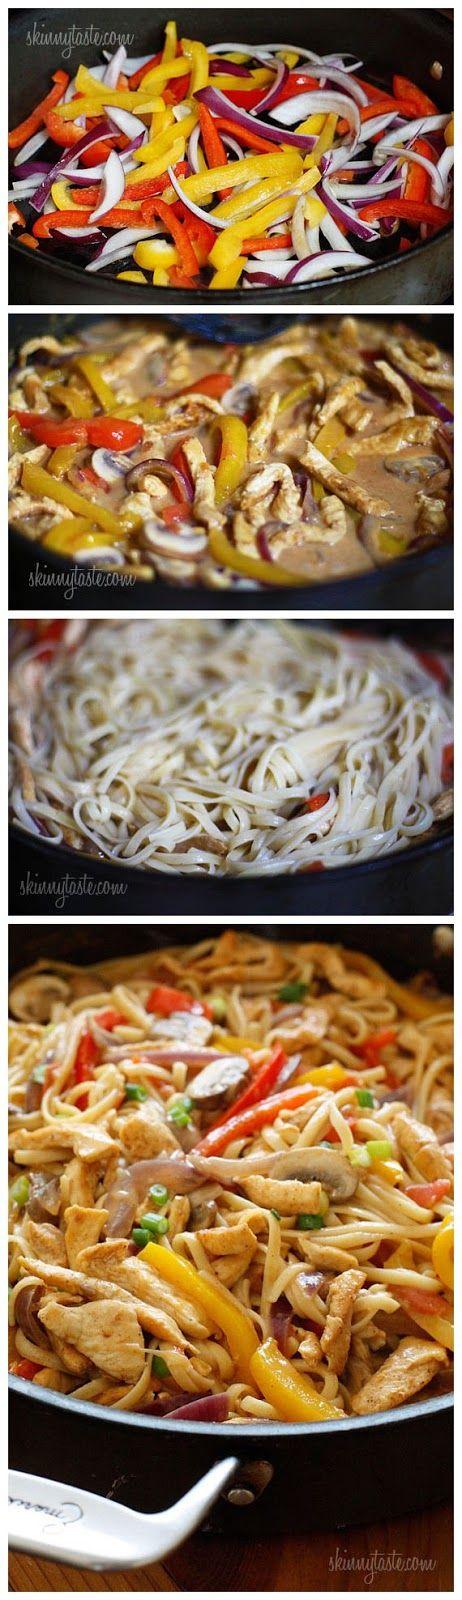 Recipe Best: Cajun Chicken Pasta on the Lighter Side